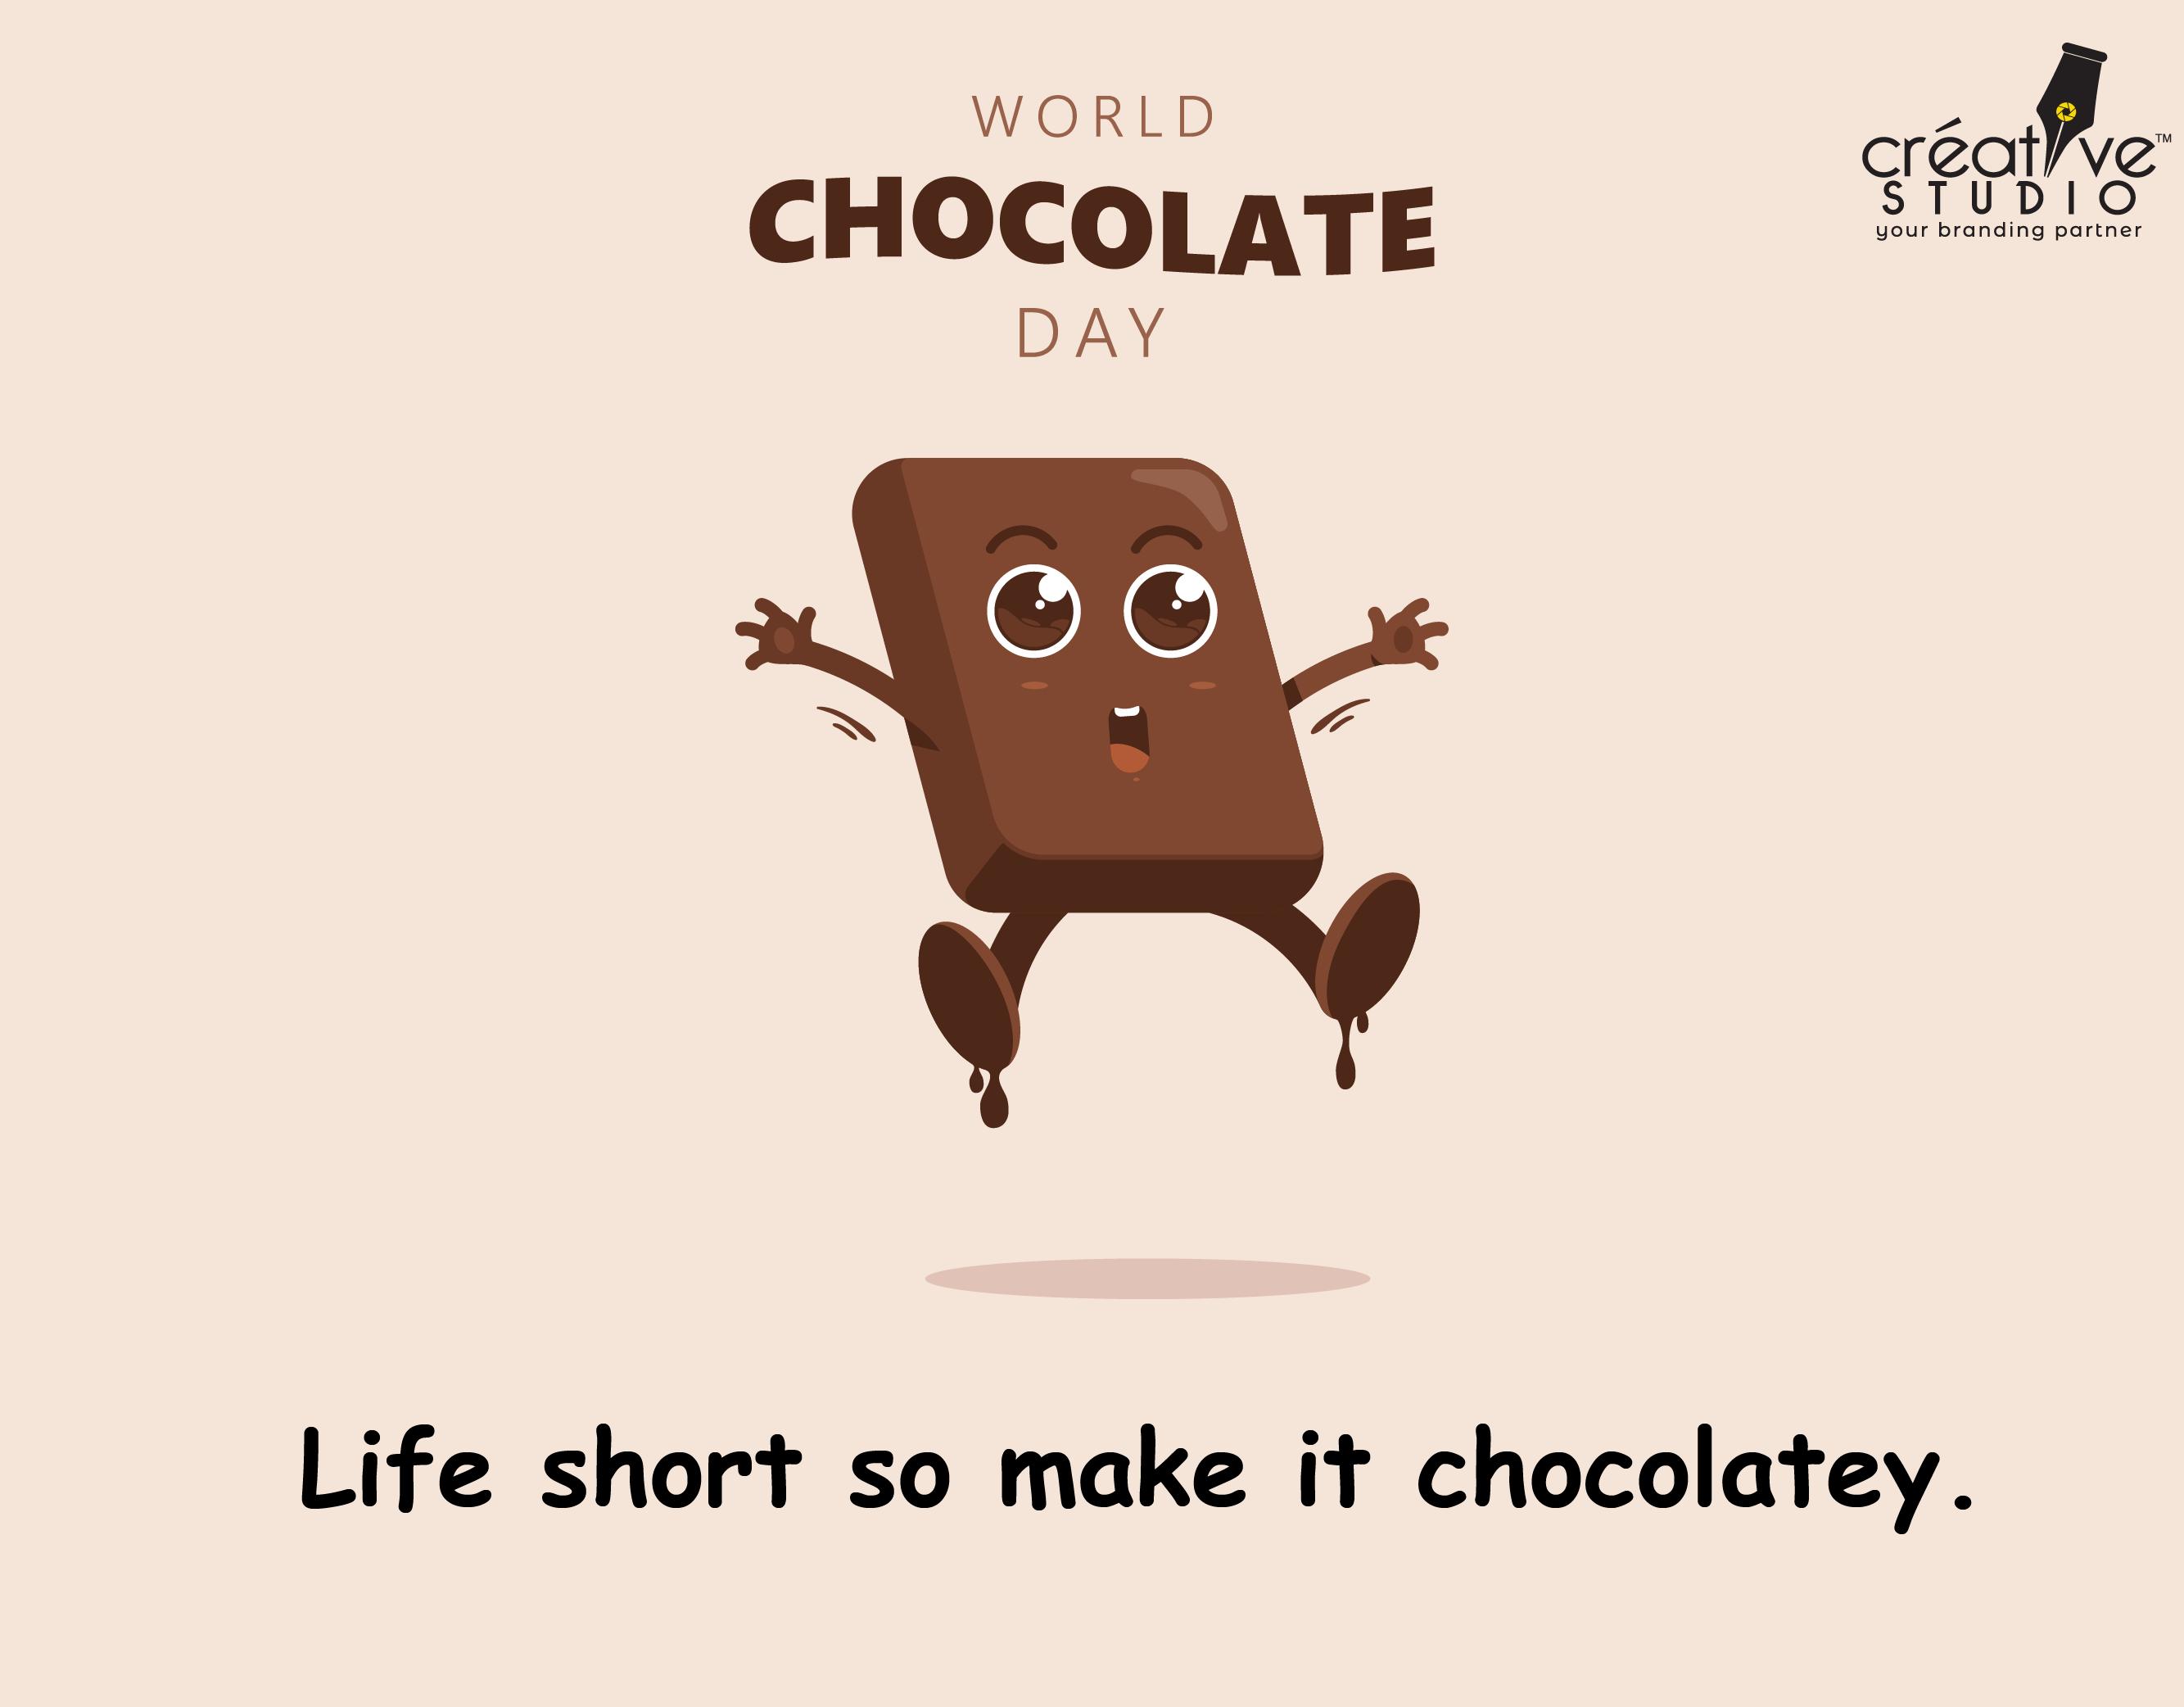 CHOCOLATE DAY 01 - Chocolate